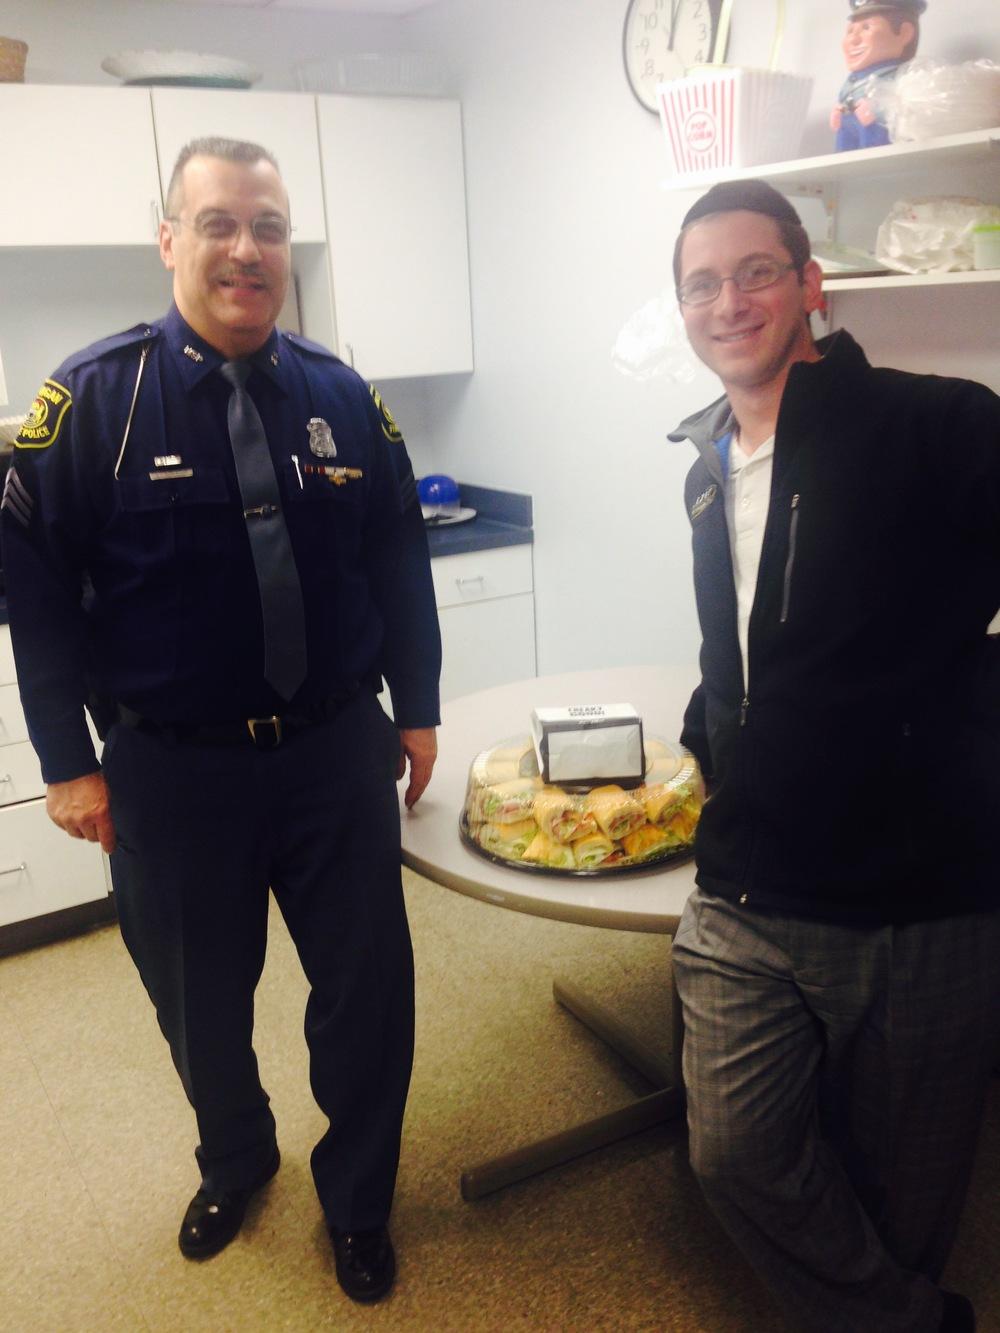 Sgt. J Robertson, Michigan State Police & Boruch Loriner, Quantam Solutions